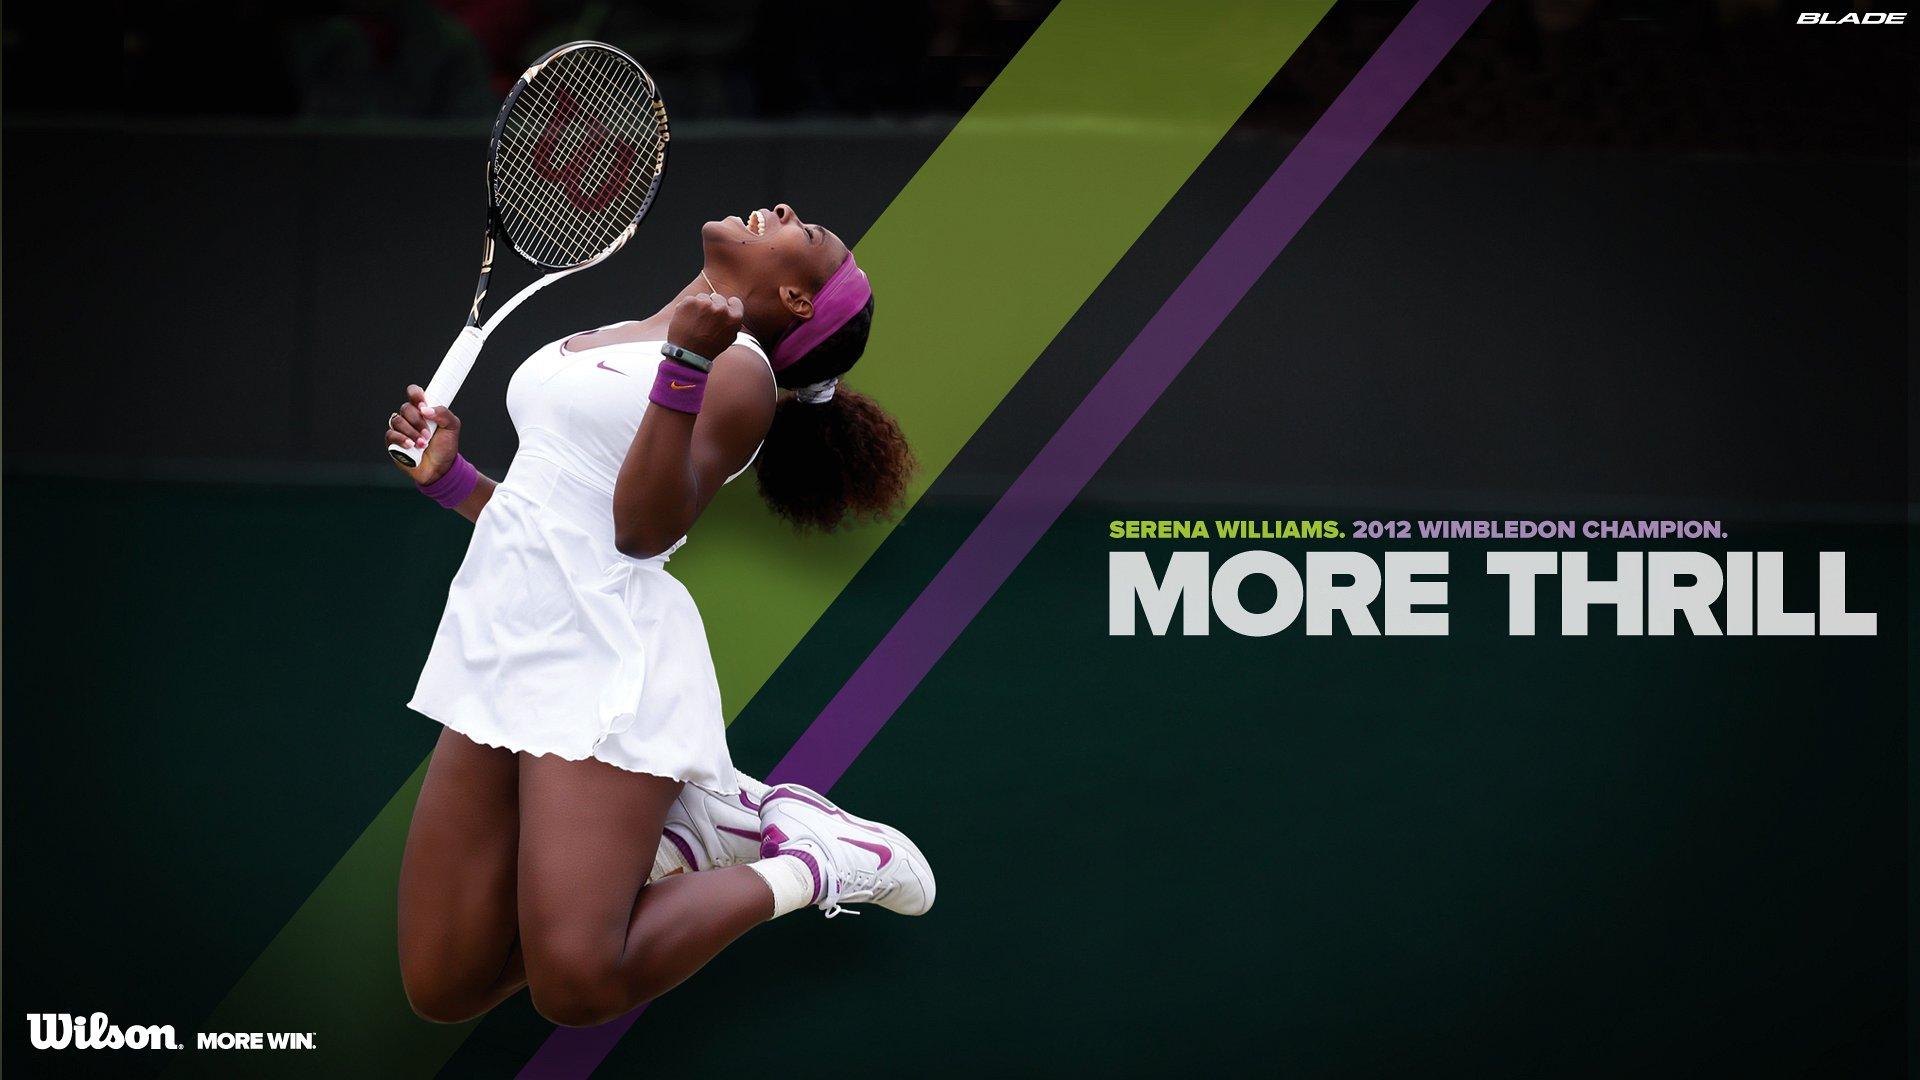 Serena Williams Wallpaper 13   1920 X 1080 stmednet 1920x1080